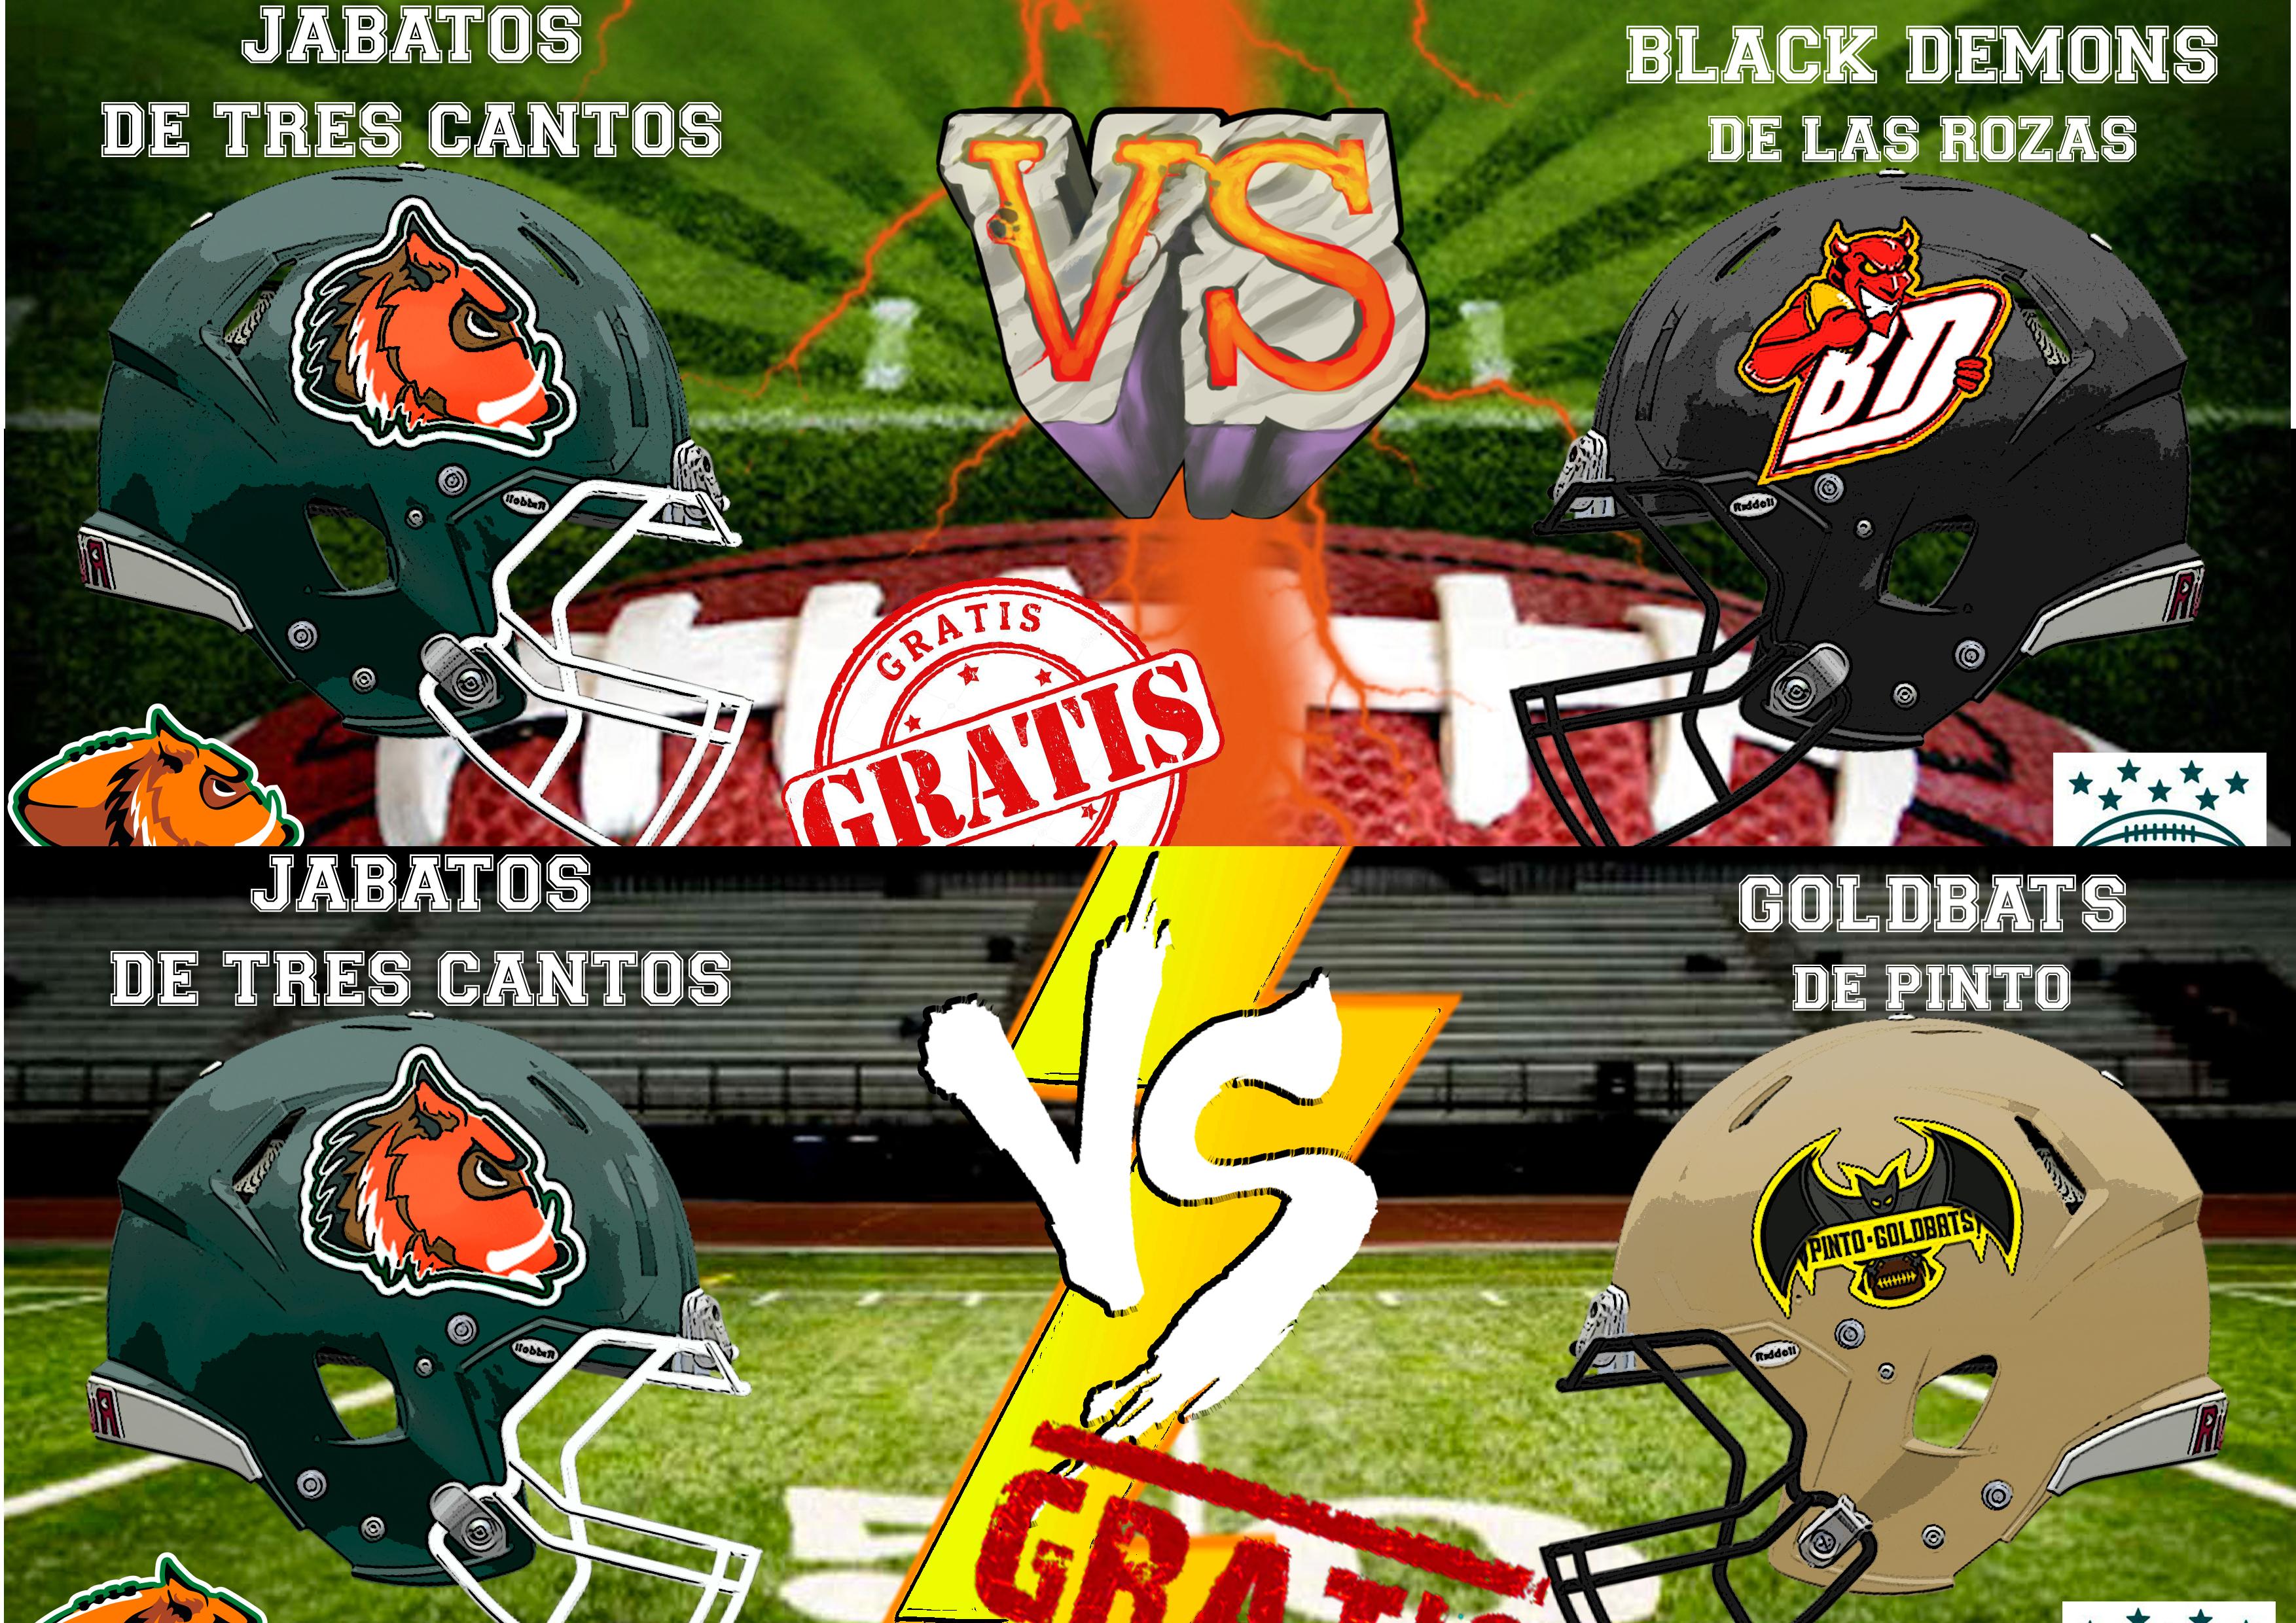 Fin de semana de doble ración de Fútbol Americano en Tres Cantos - JABATOS  CLUB DE FOOTBALL AMERICANO bab482f95f9